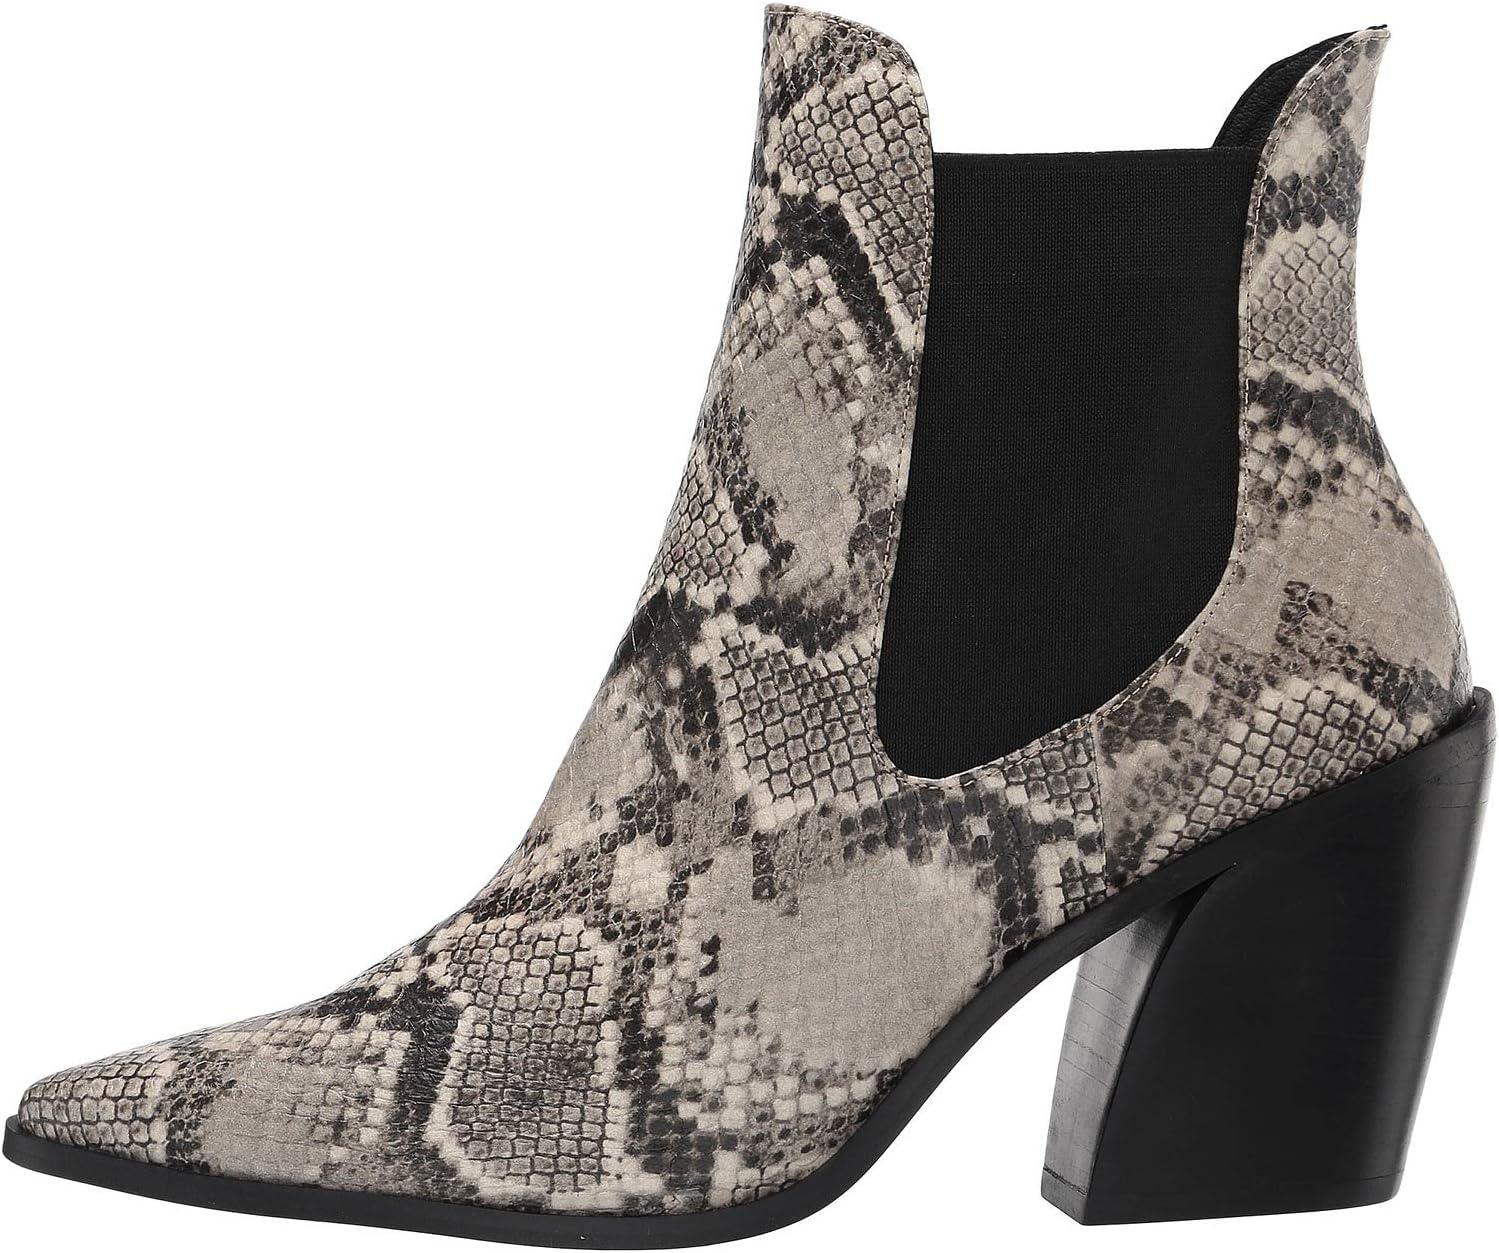 STEVEN NEW YORK Gail   Women's shoes   2020 Newest